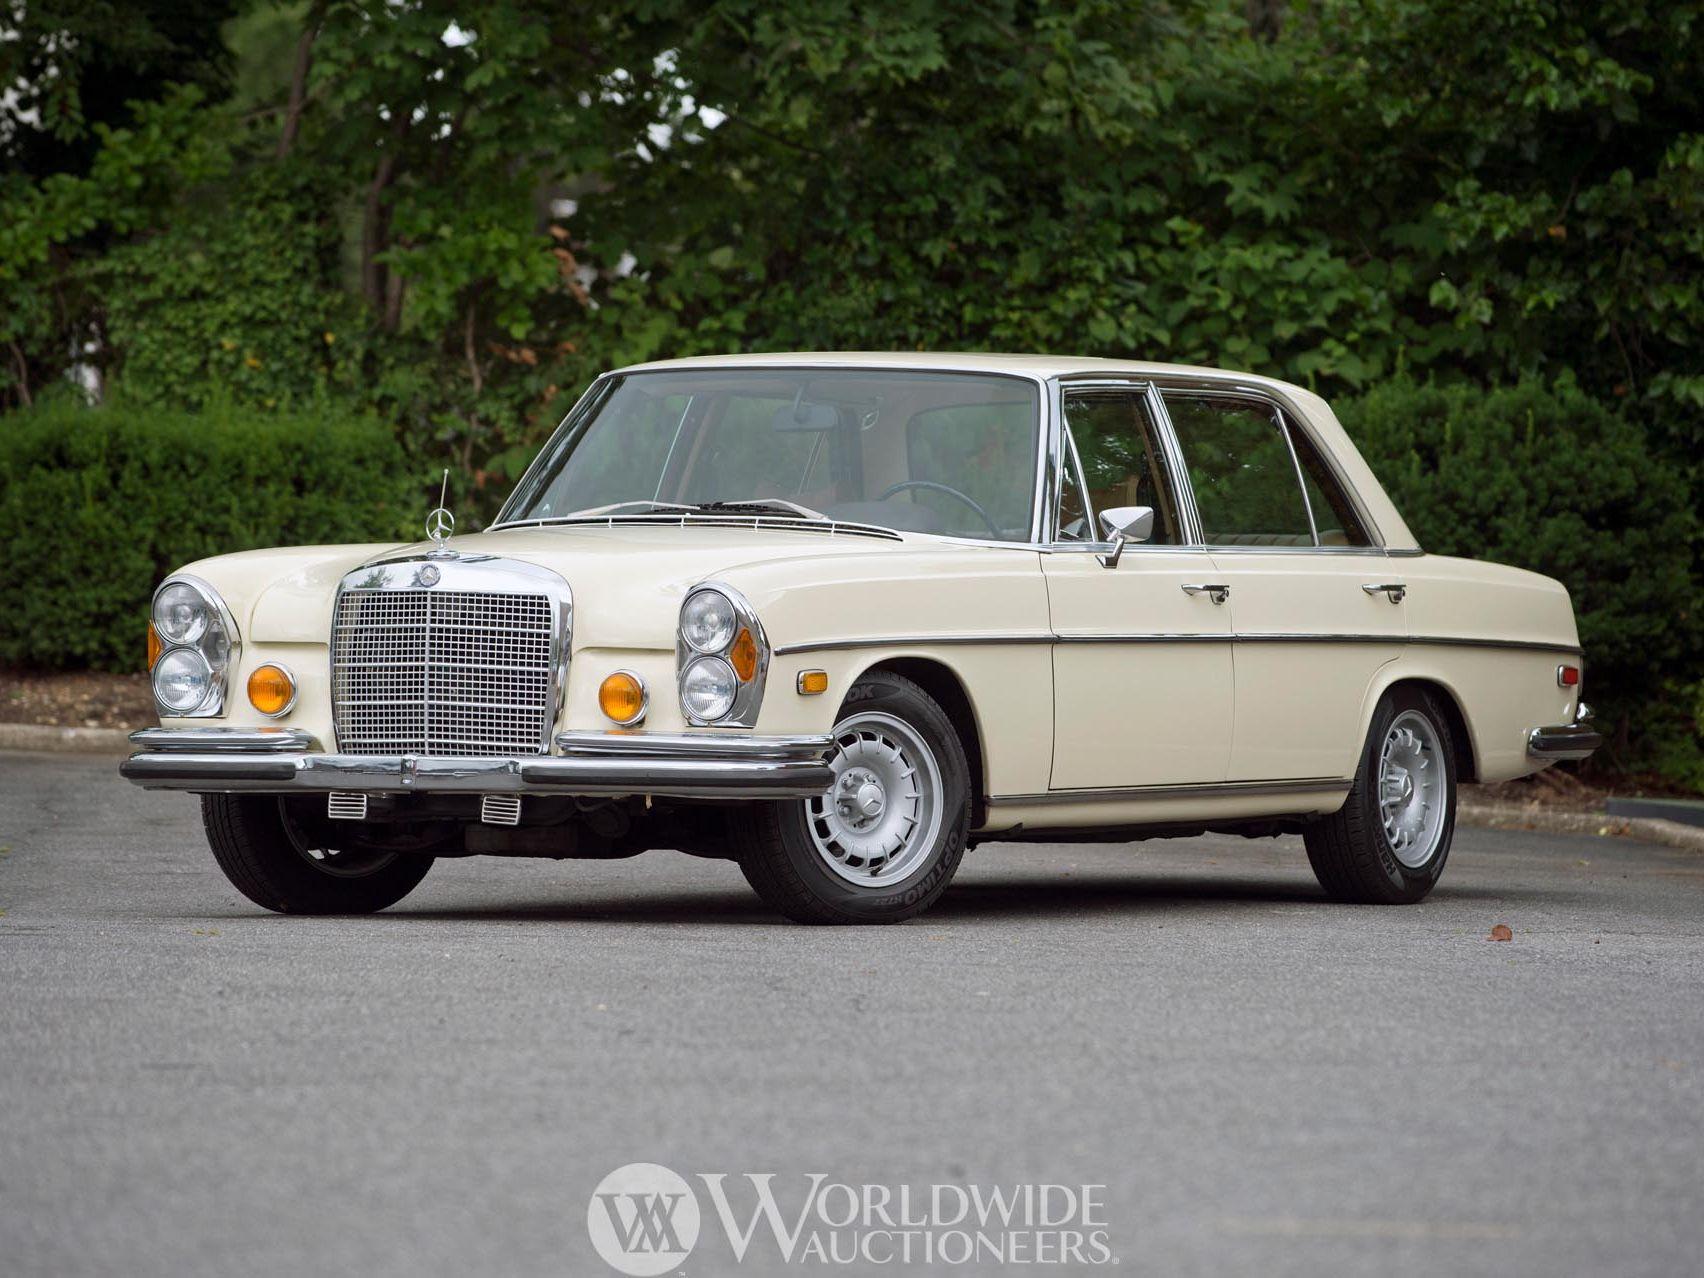 1971 Mercedes-Benz 300SEL 6.3 Sedan